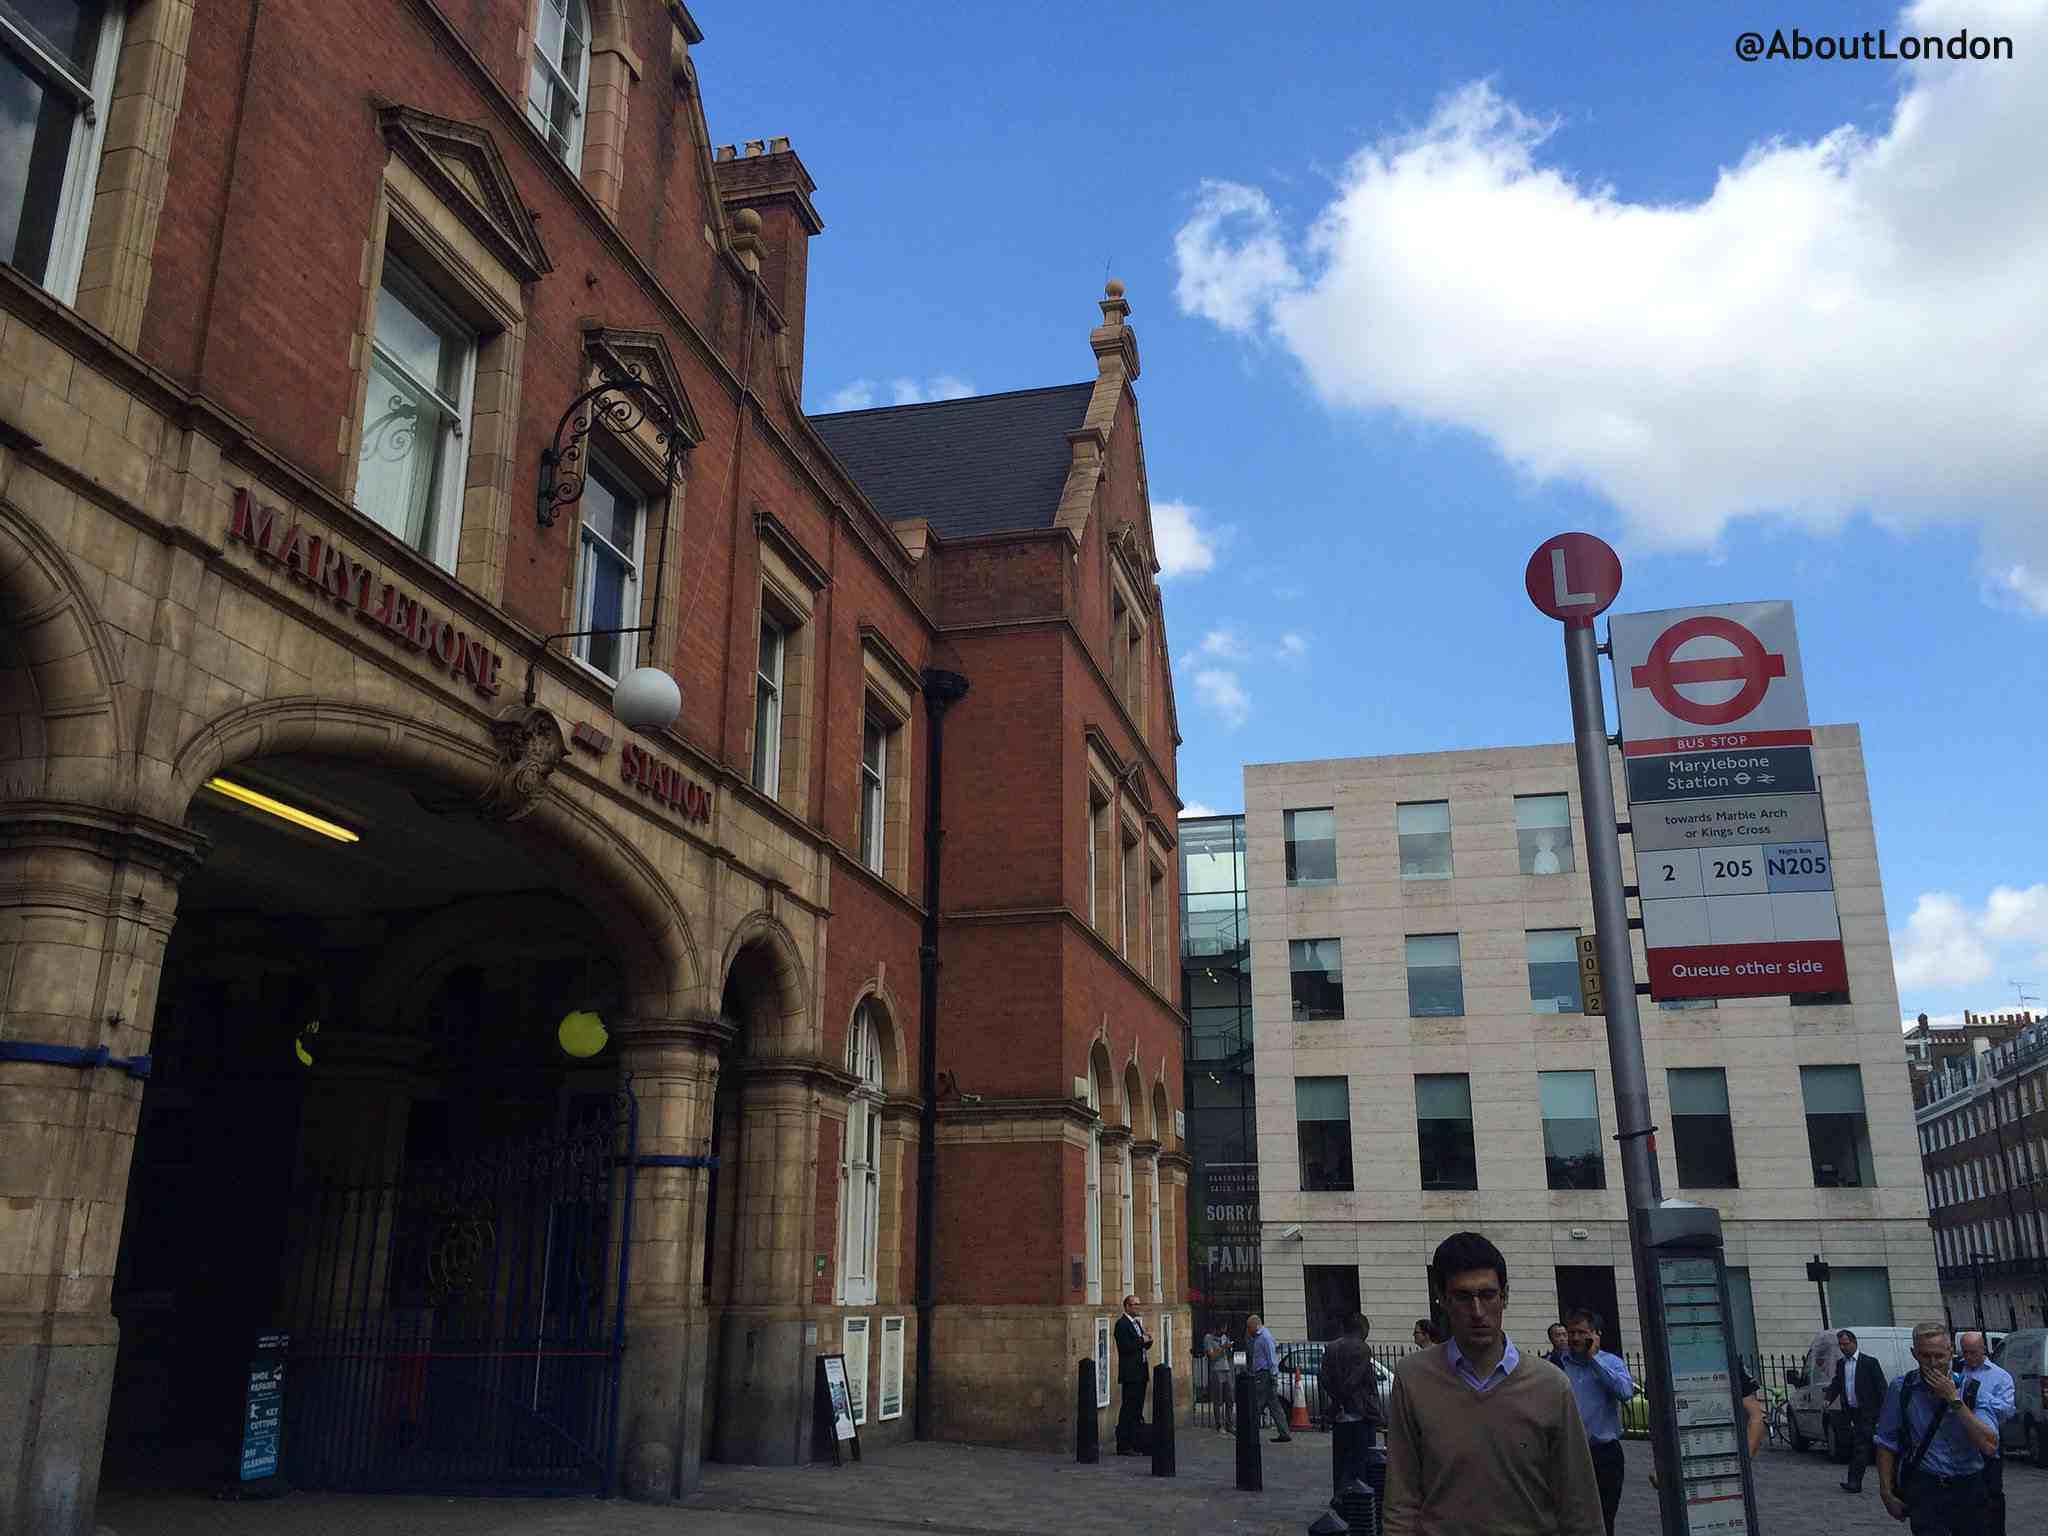 Marylebone Station exterior